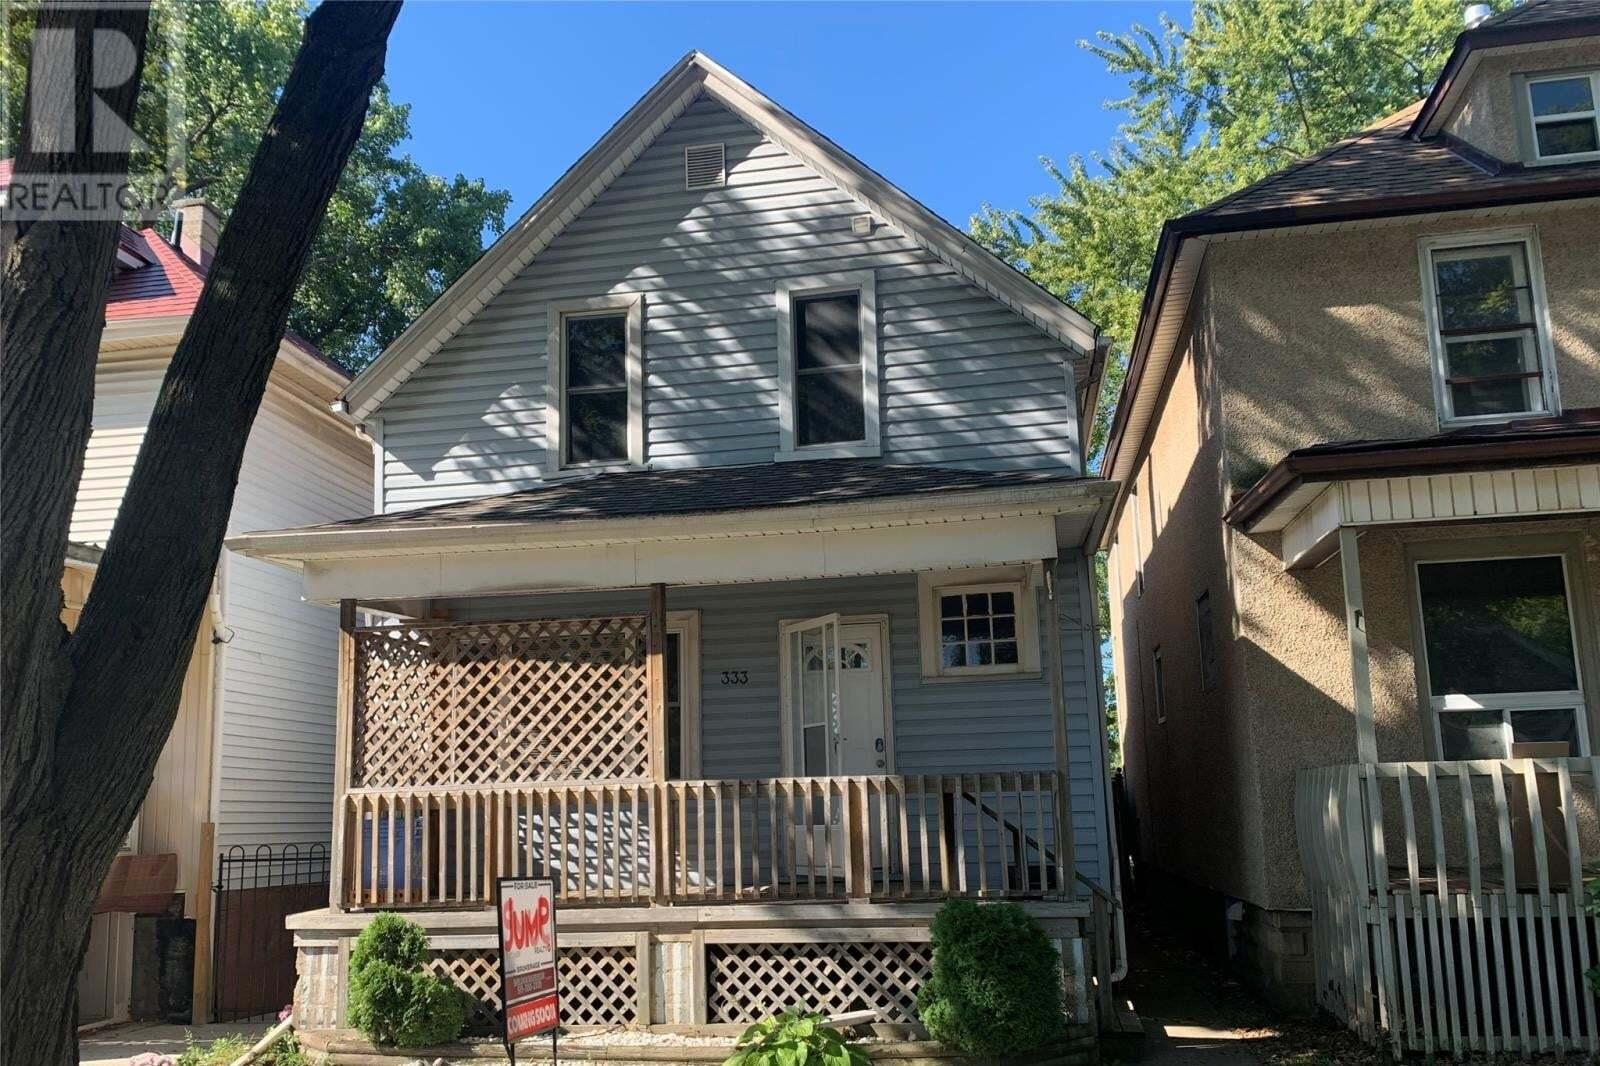 House for sale at 333 Bridge  Windsor Ontario - MLS: 20012372